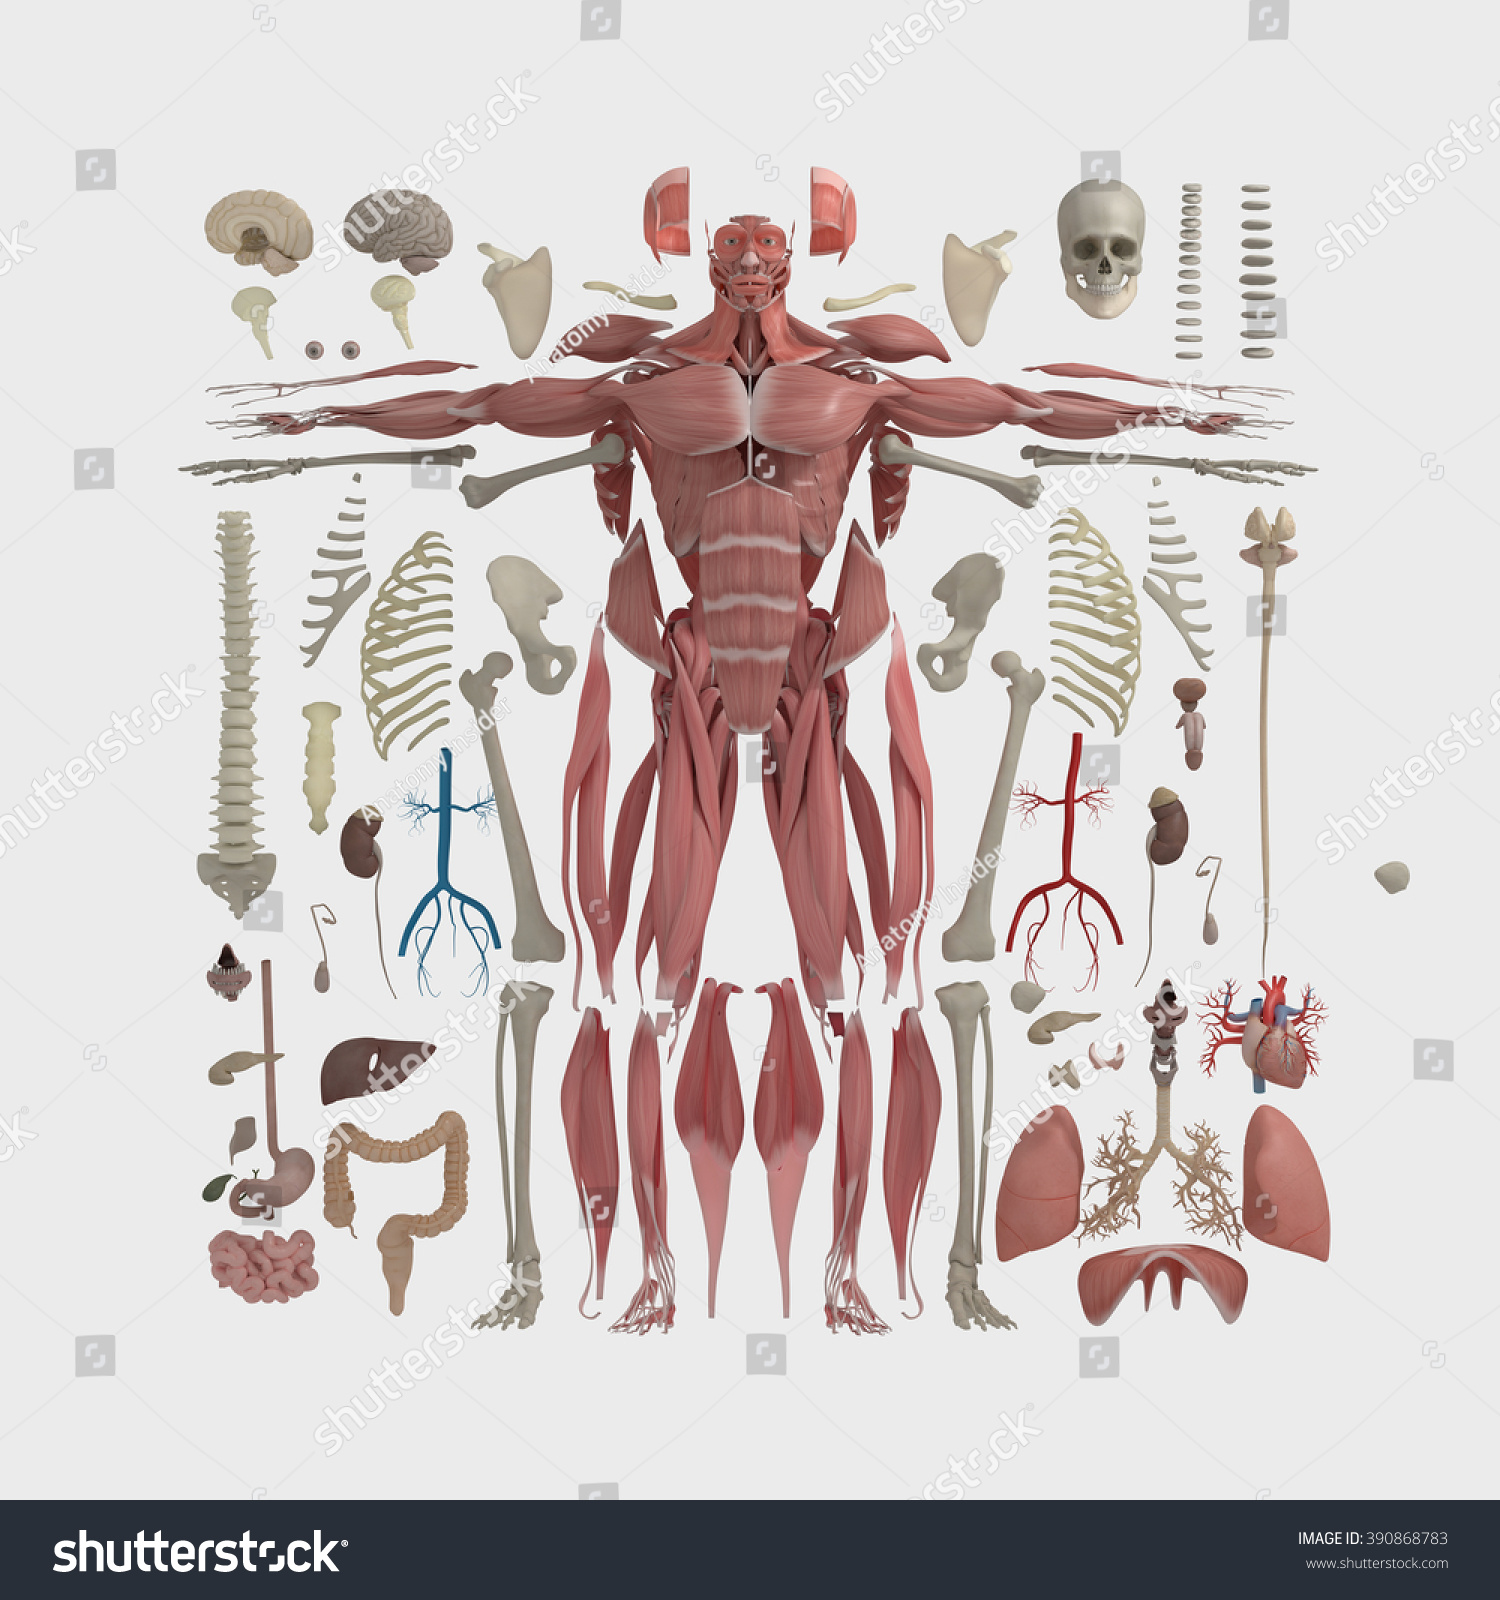 Human Anatomy Flat Lay Illustration Body Stockillustration 390868783